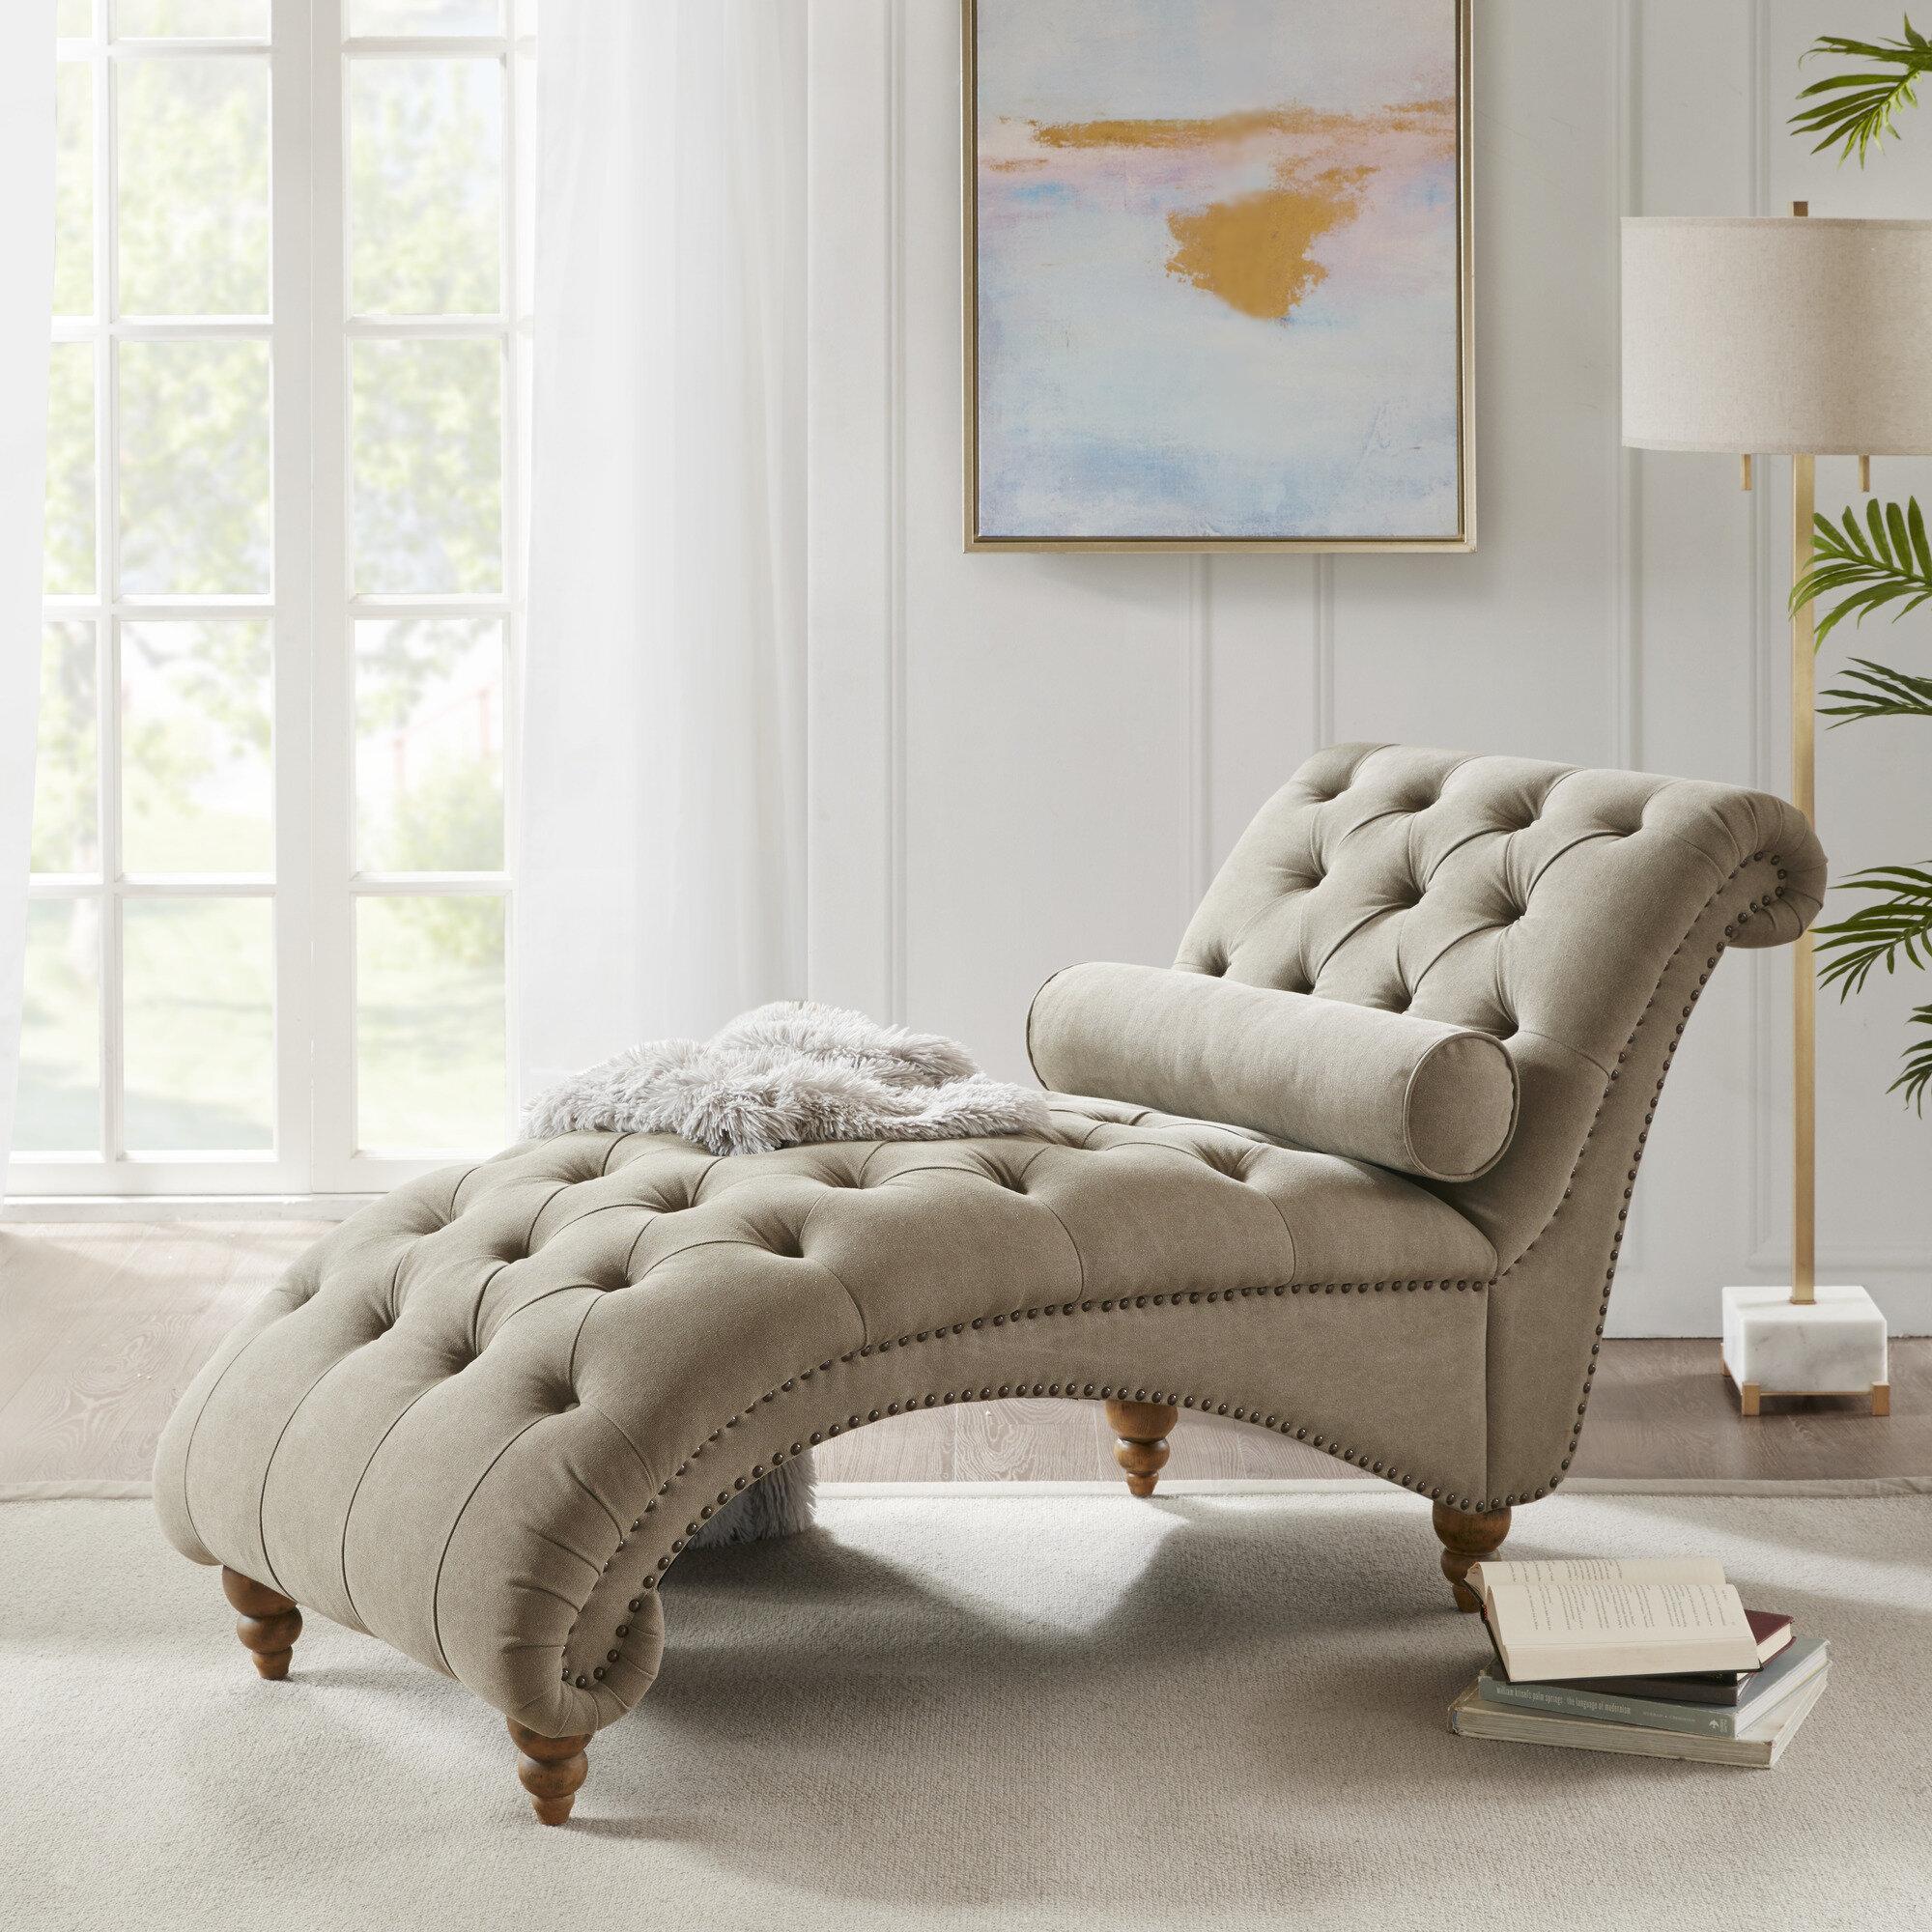 Scandia Chaise Lounge